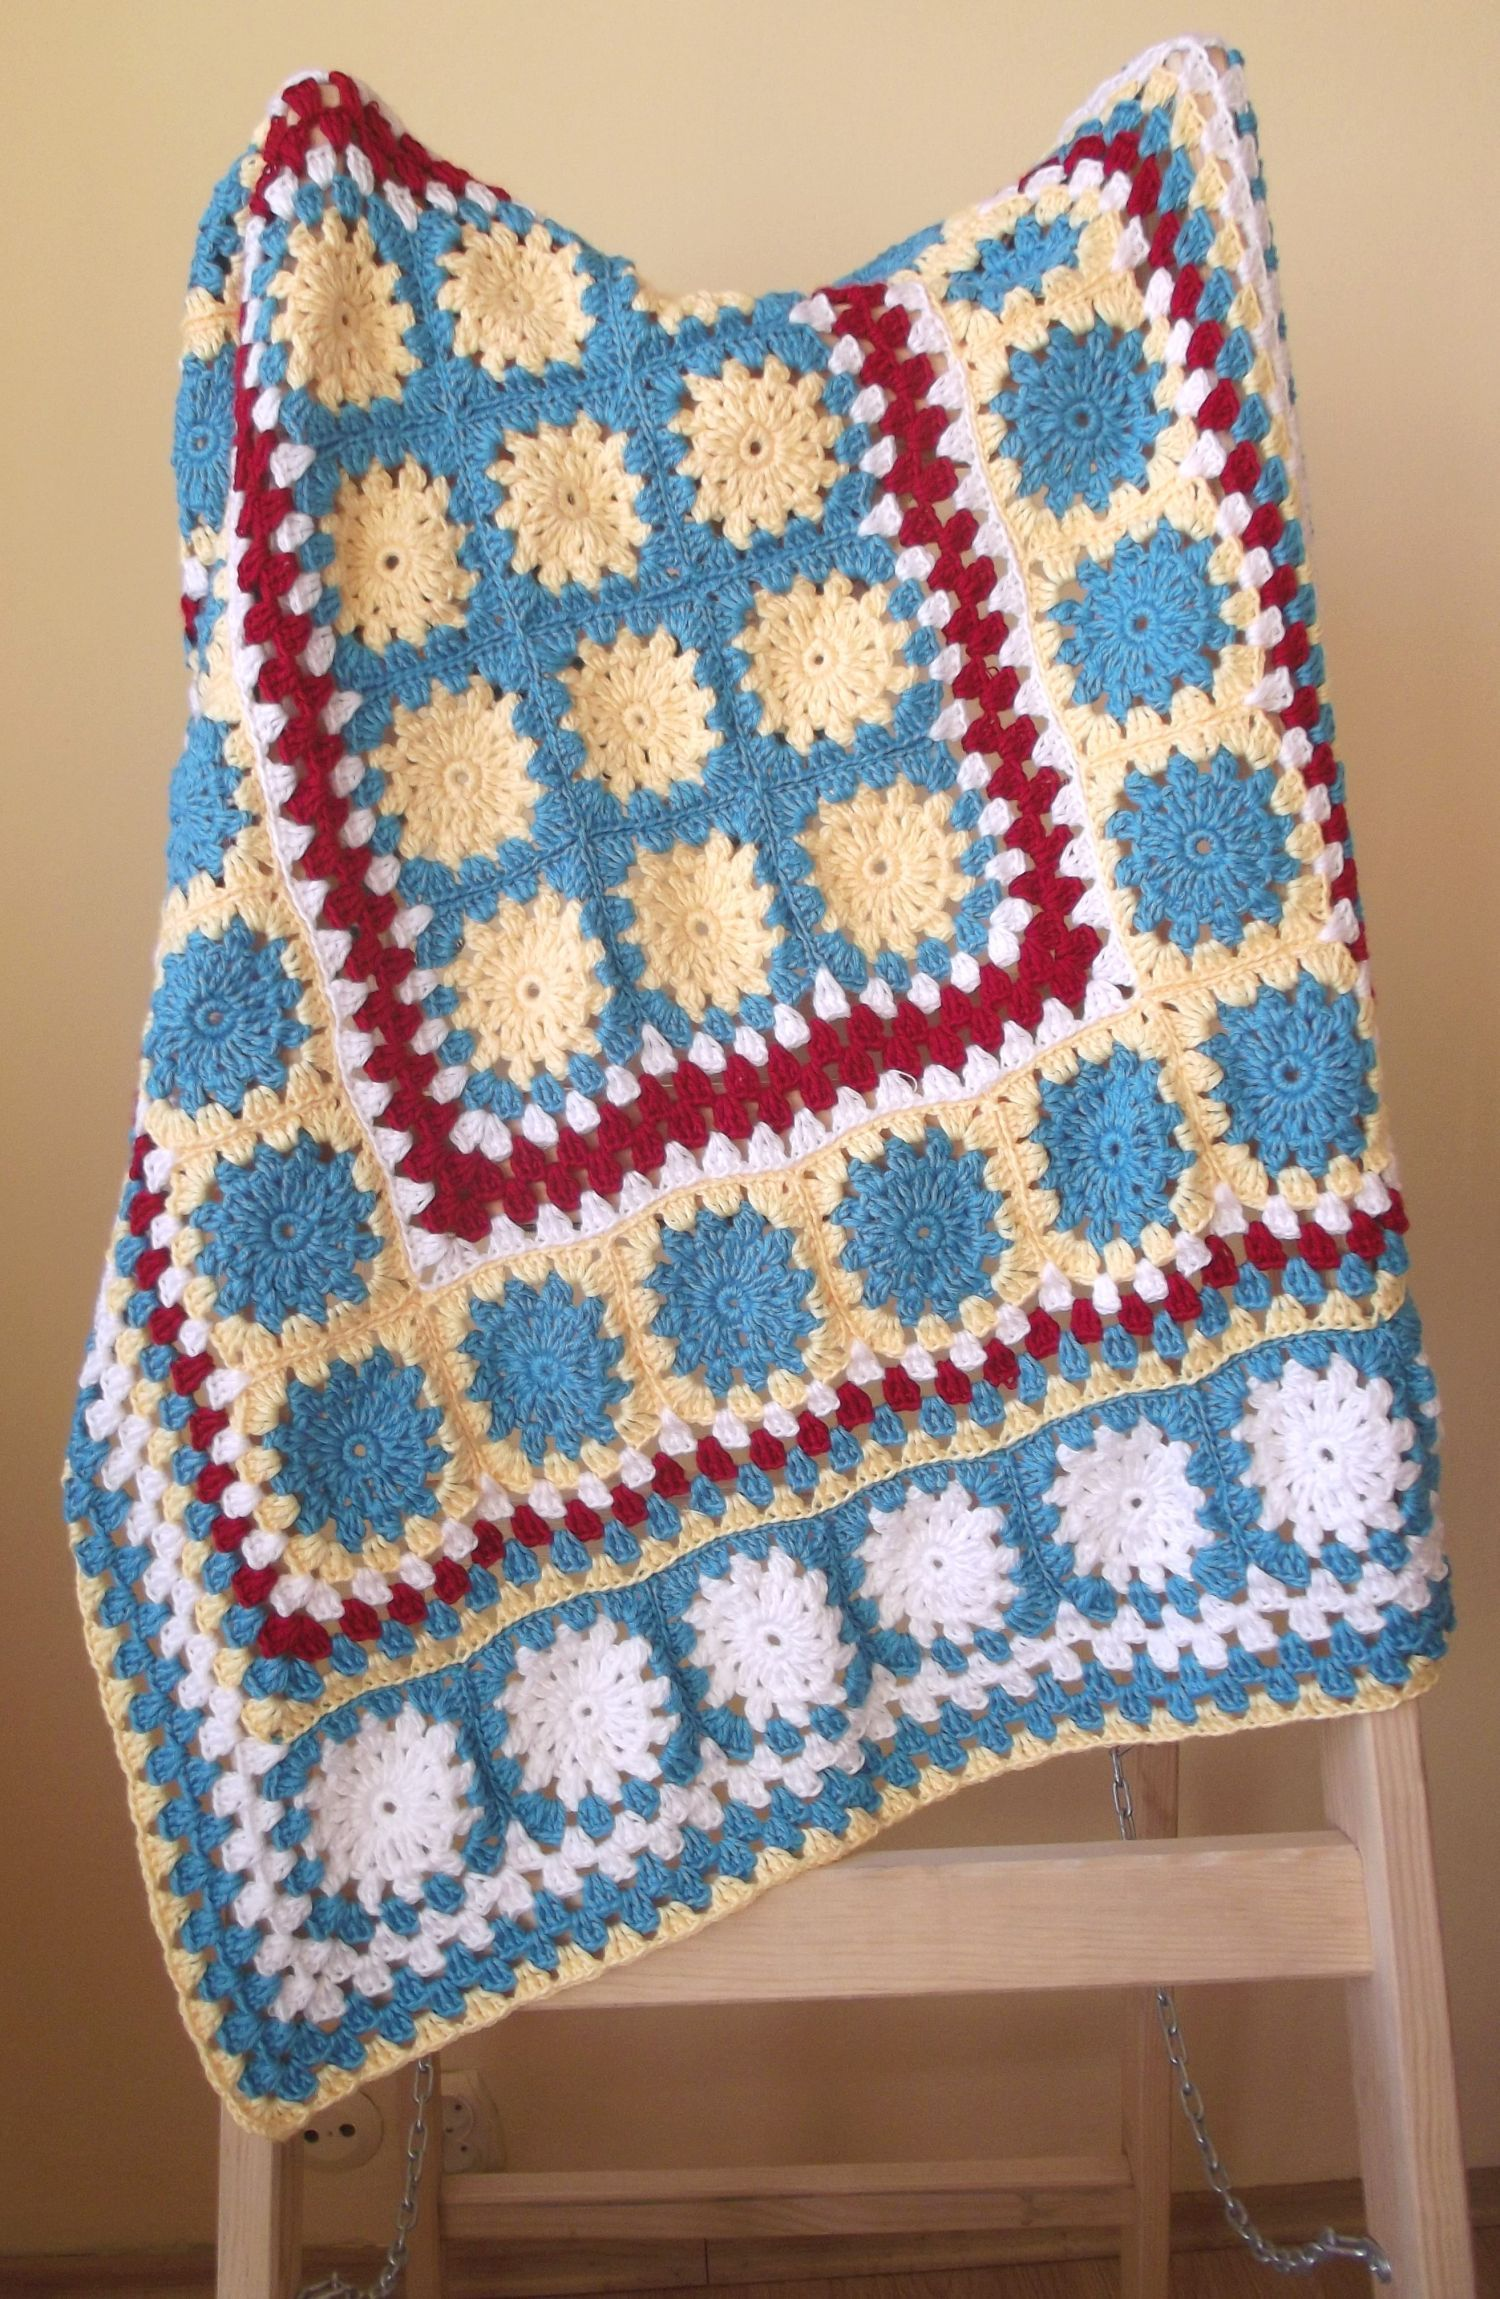 Crochet Patterns Pinterest : Crochet baby blanket. crochet patterns Pinterest